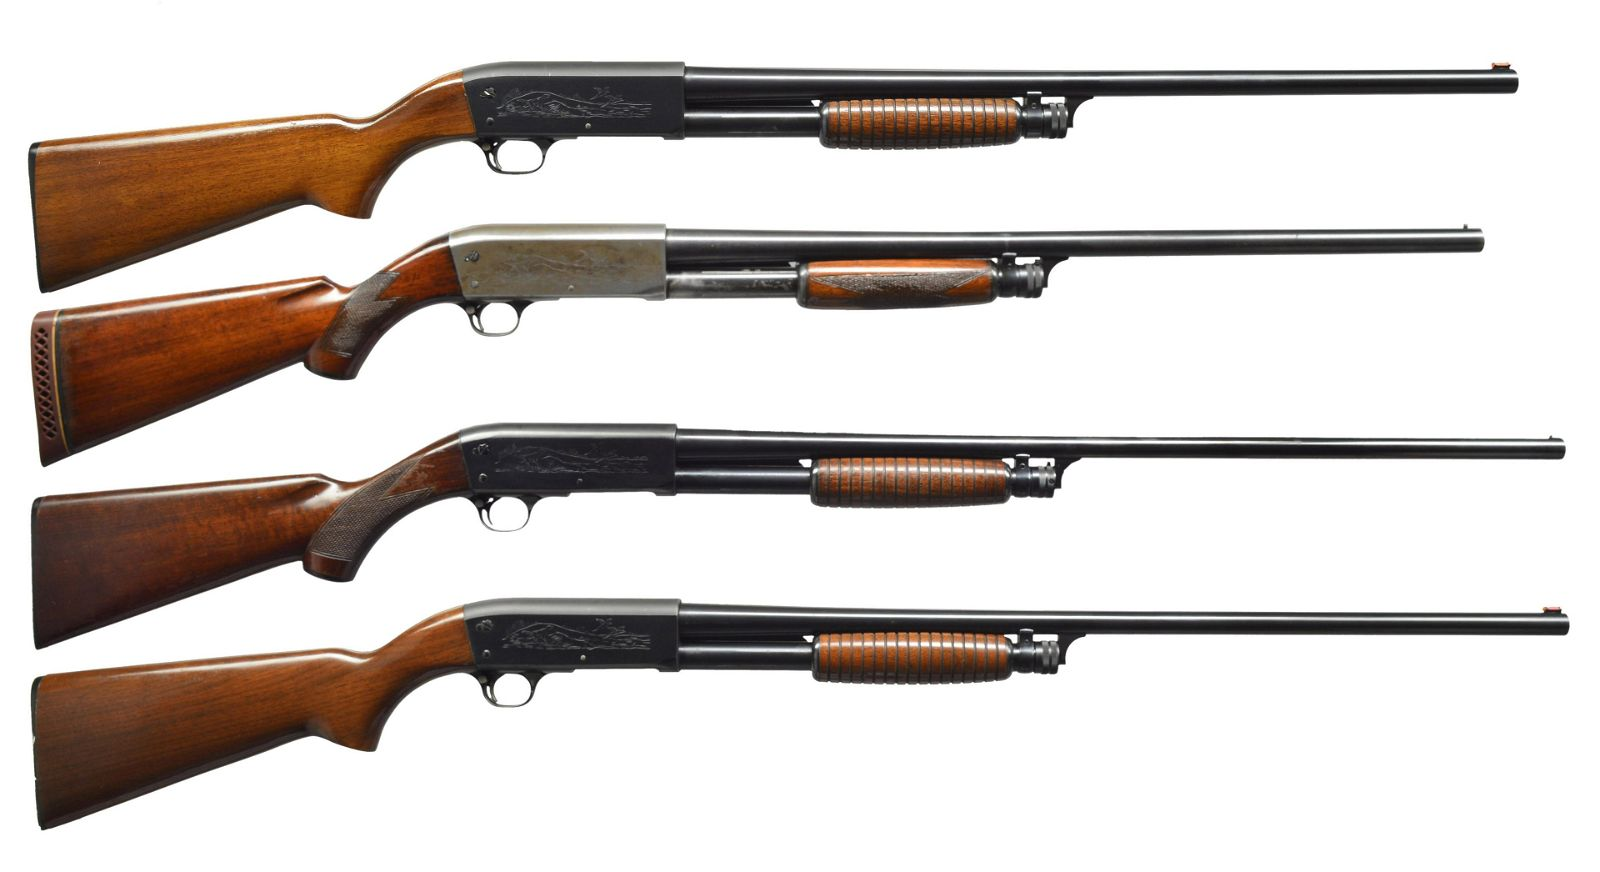 Model 37 shotgun ithaca Classic Guns: